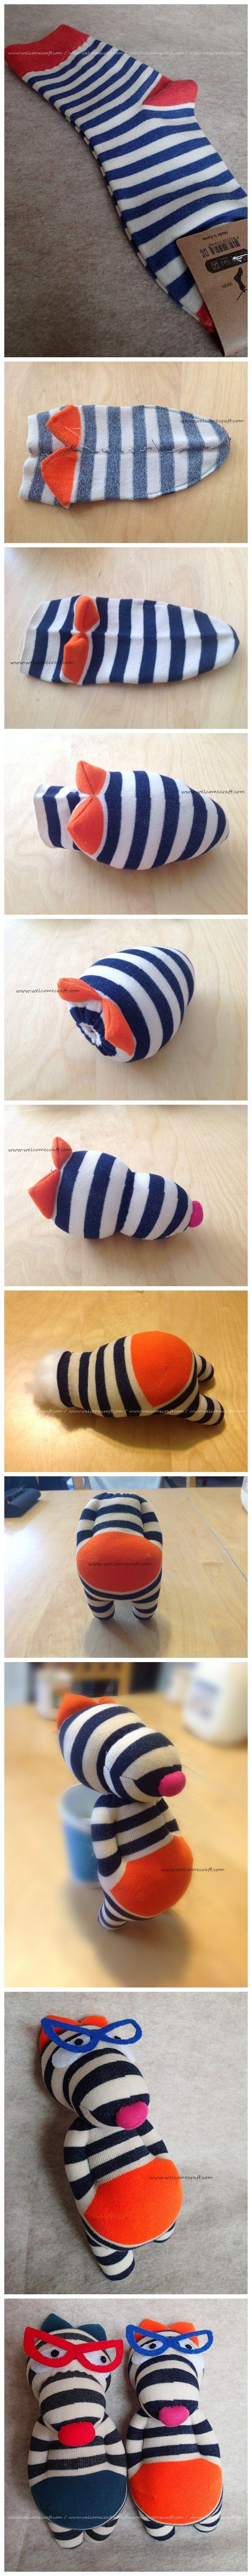 An ordinary stripes socks turned into a wolf doll.^^ Made by - Melanie Park